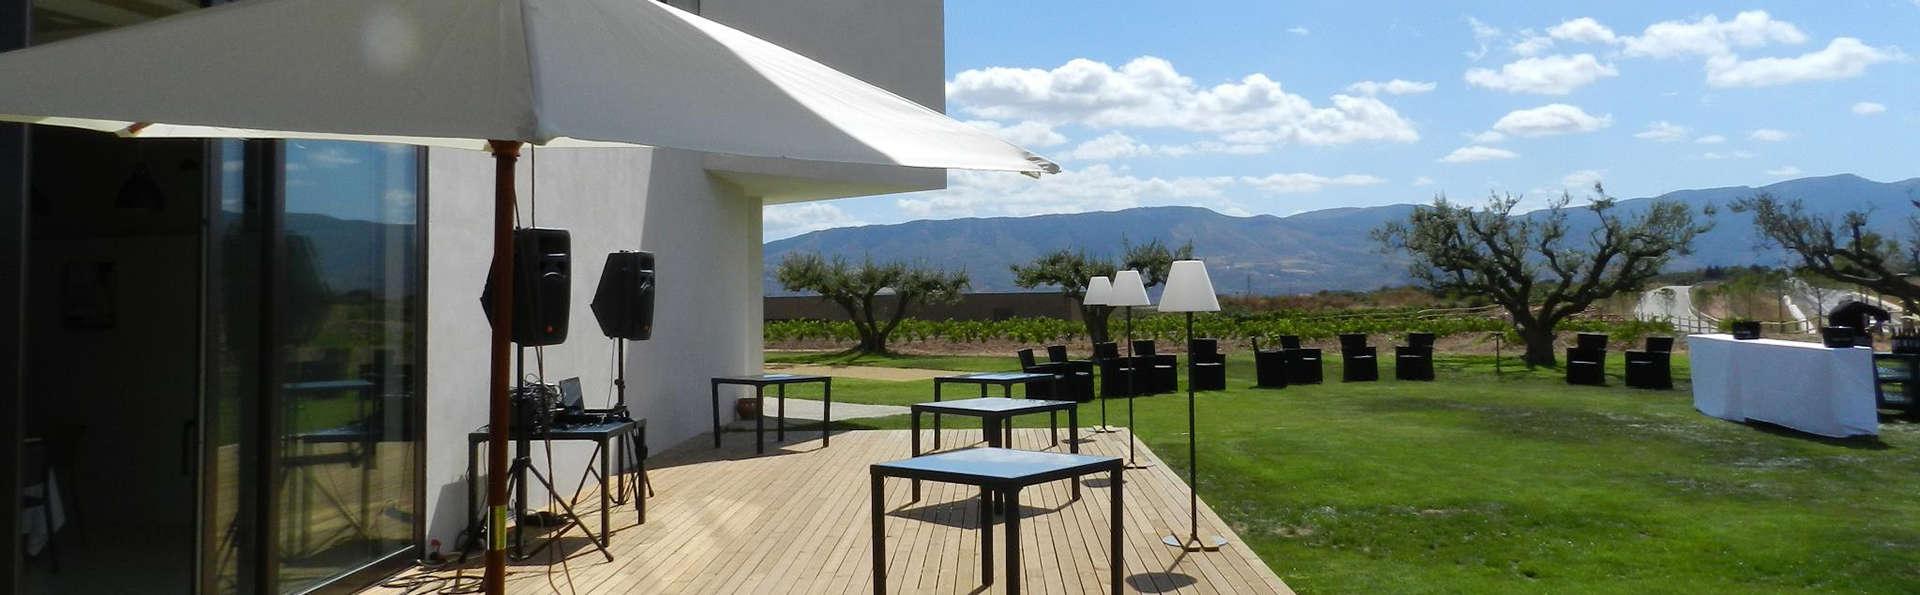 Hotel Bodega Finca de los Arandinos - EDIT_terrace.jpg